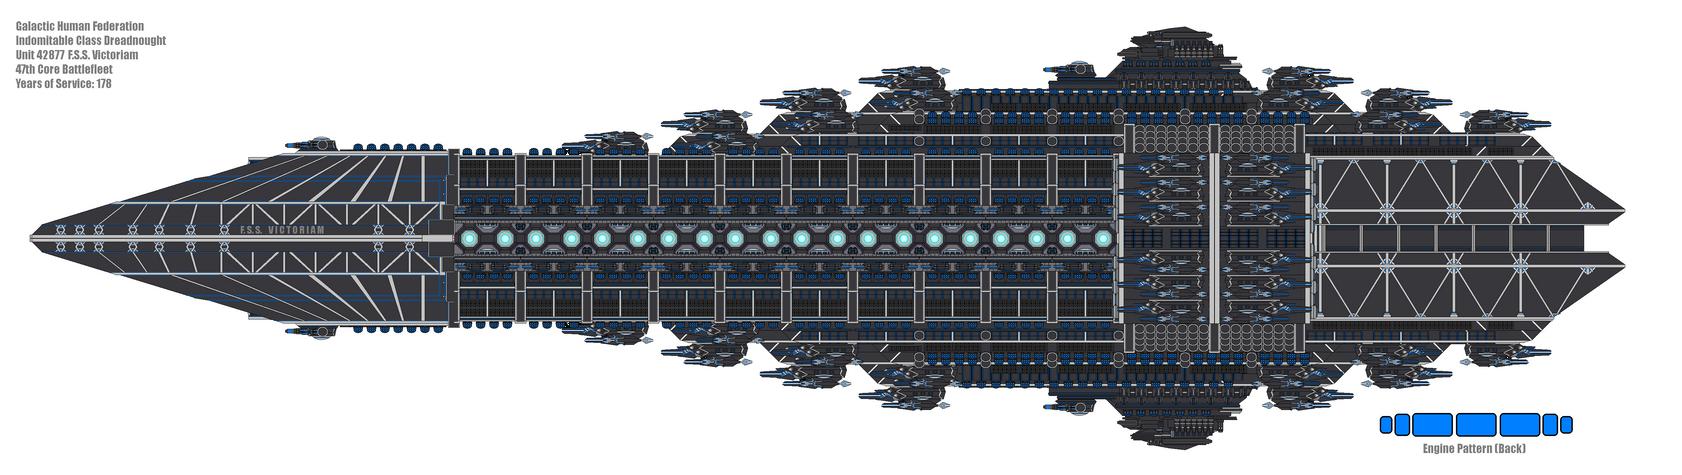 DAOT Indomitable class Cherno Configuration